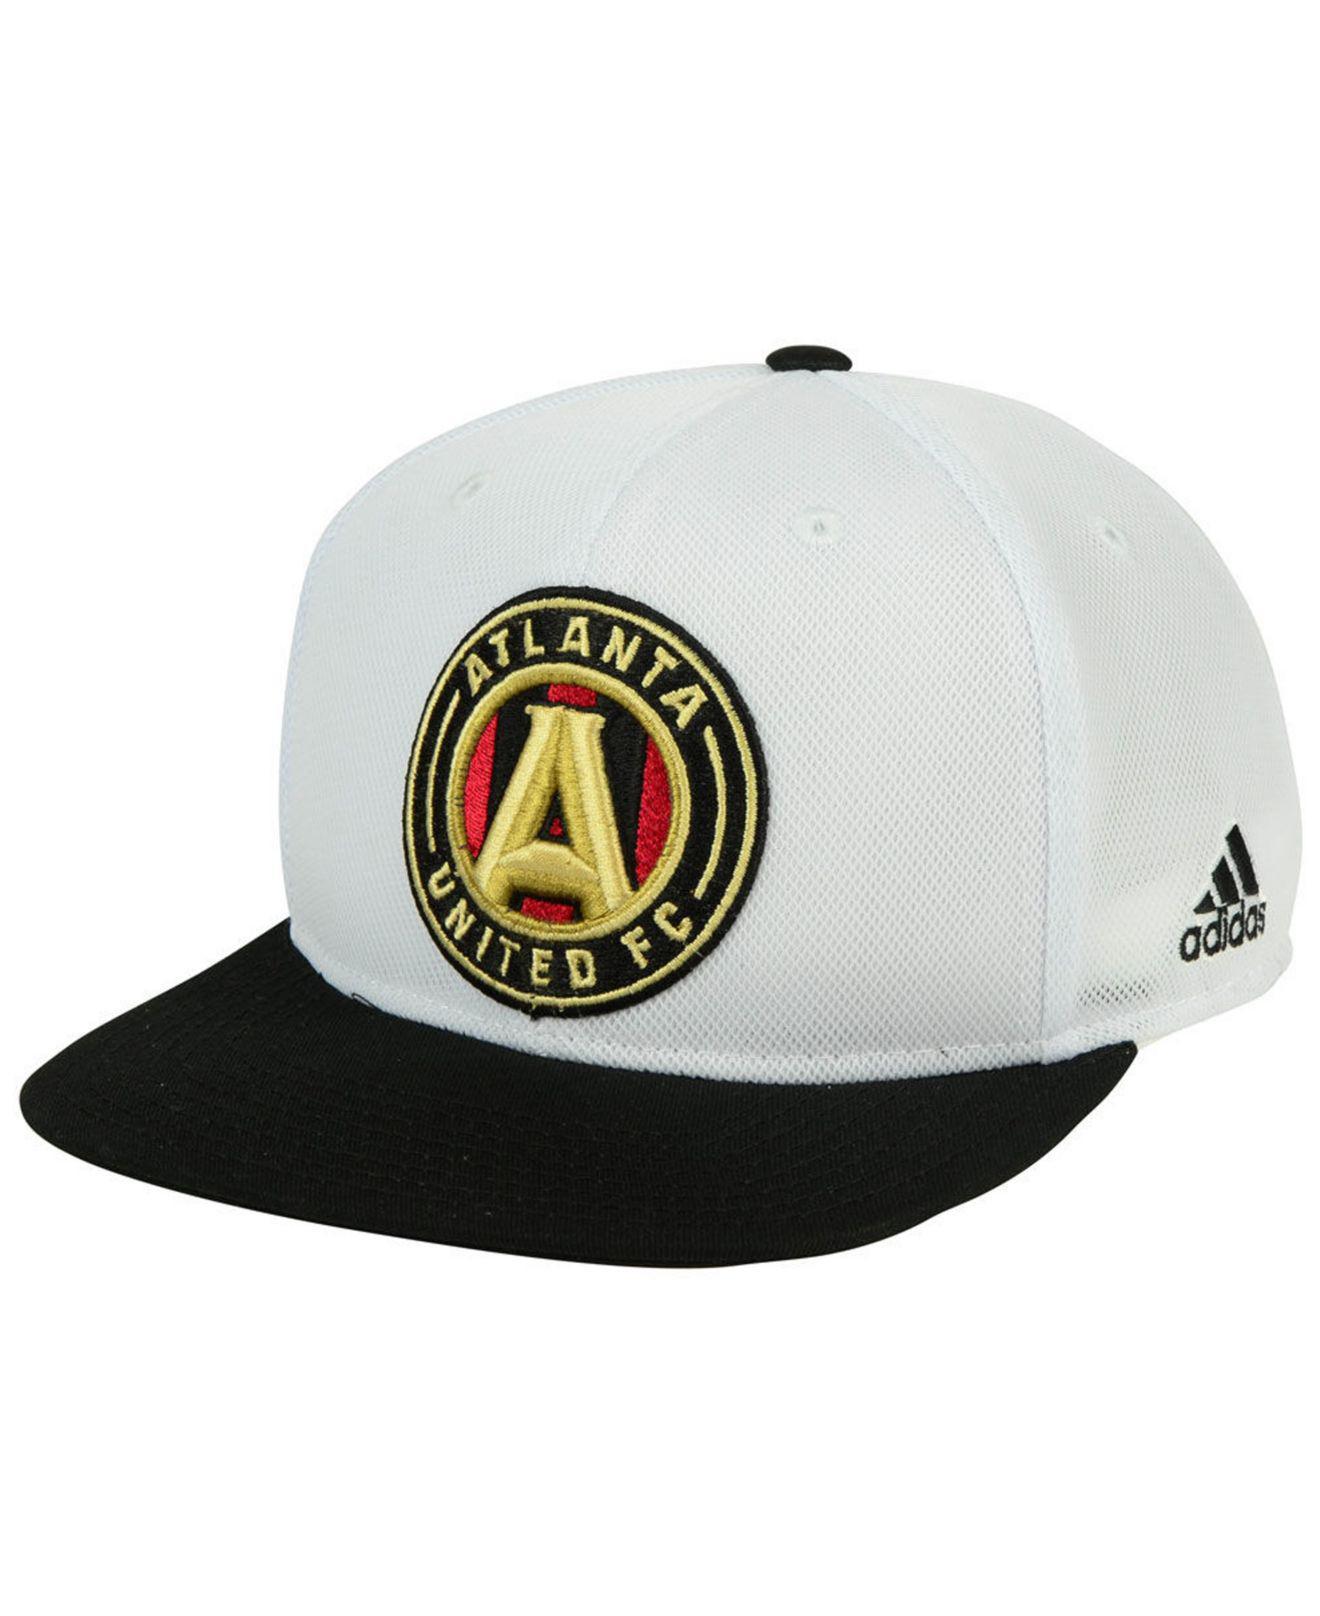 low priced 65896 43b35 adidas Atlanta United Fc 2tone Snapback Cap in Black for Men - Lyst